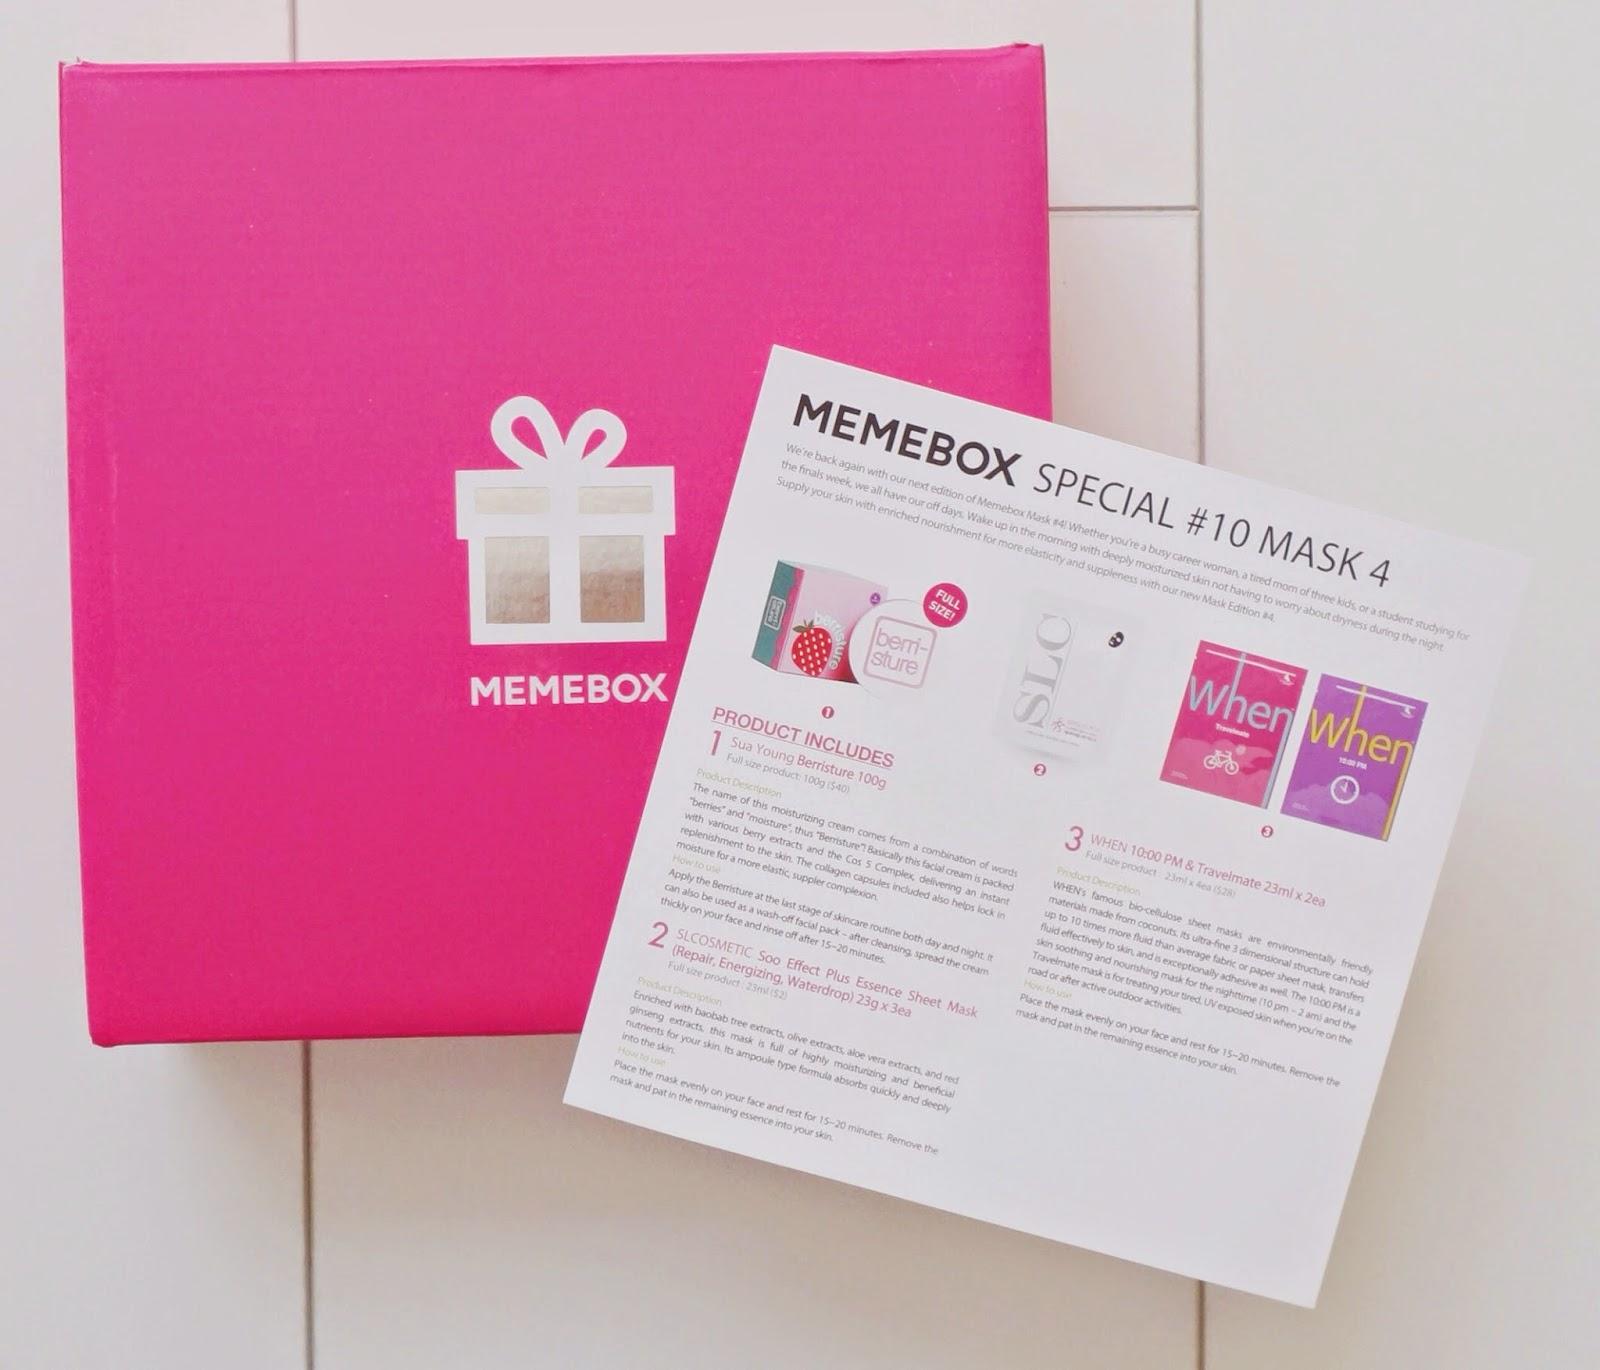 glossybox august memebox mask 4 victoria 39 s little secrets. Black Bedroom Furniture Sets. Home Design Ideas